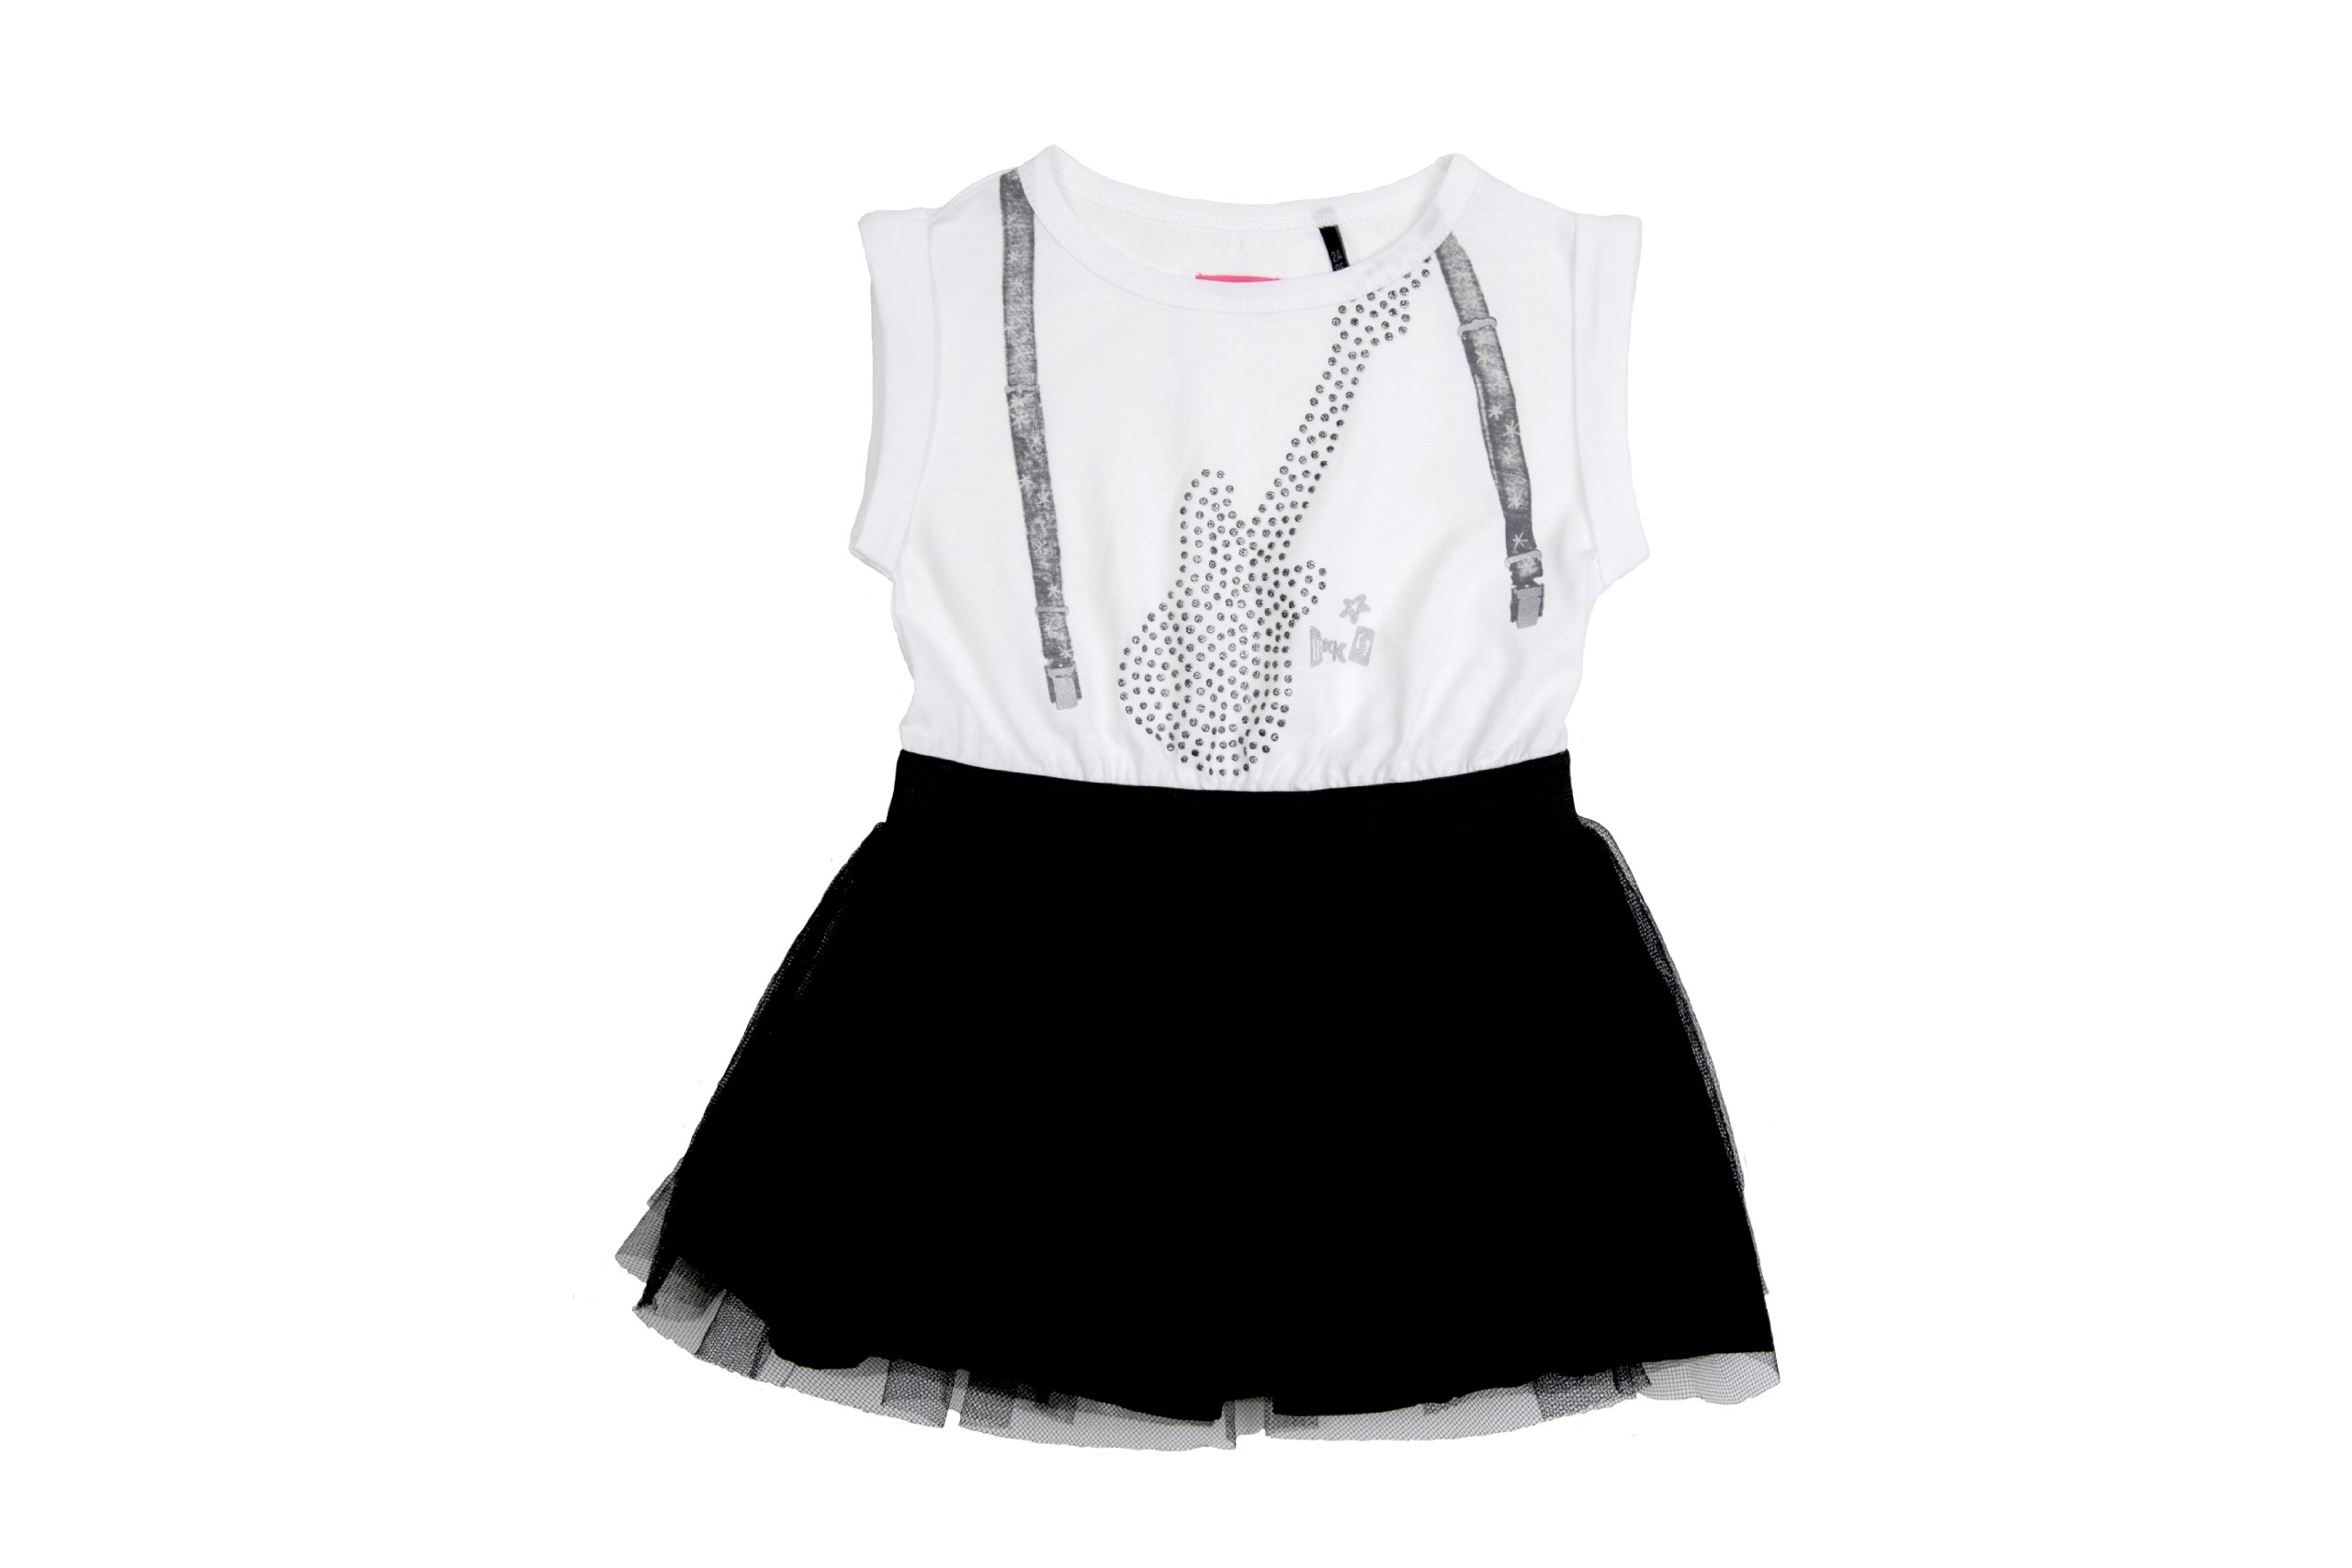 Ikks Robe Mc Dress 3a Black Buy Online In Martinique At Desertcart